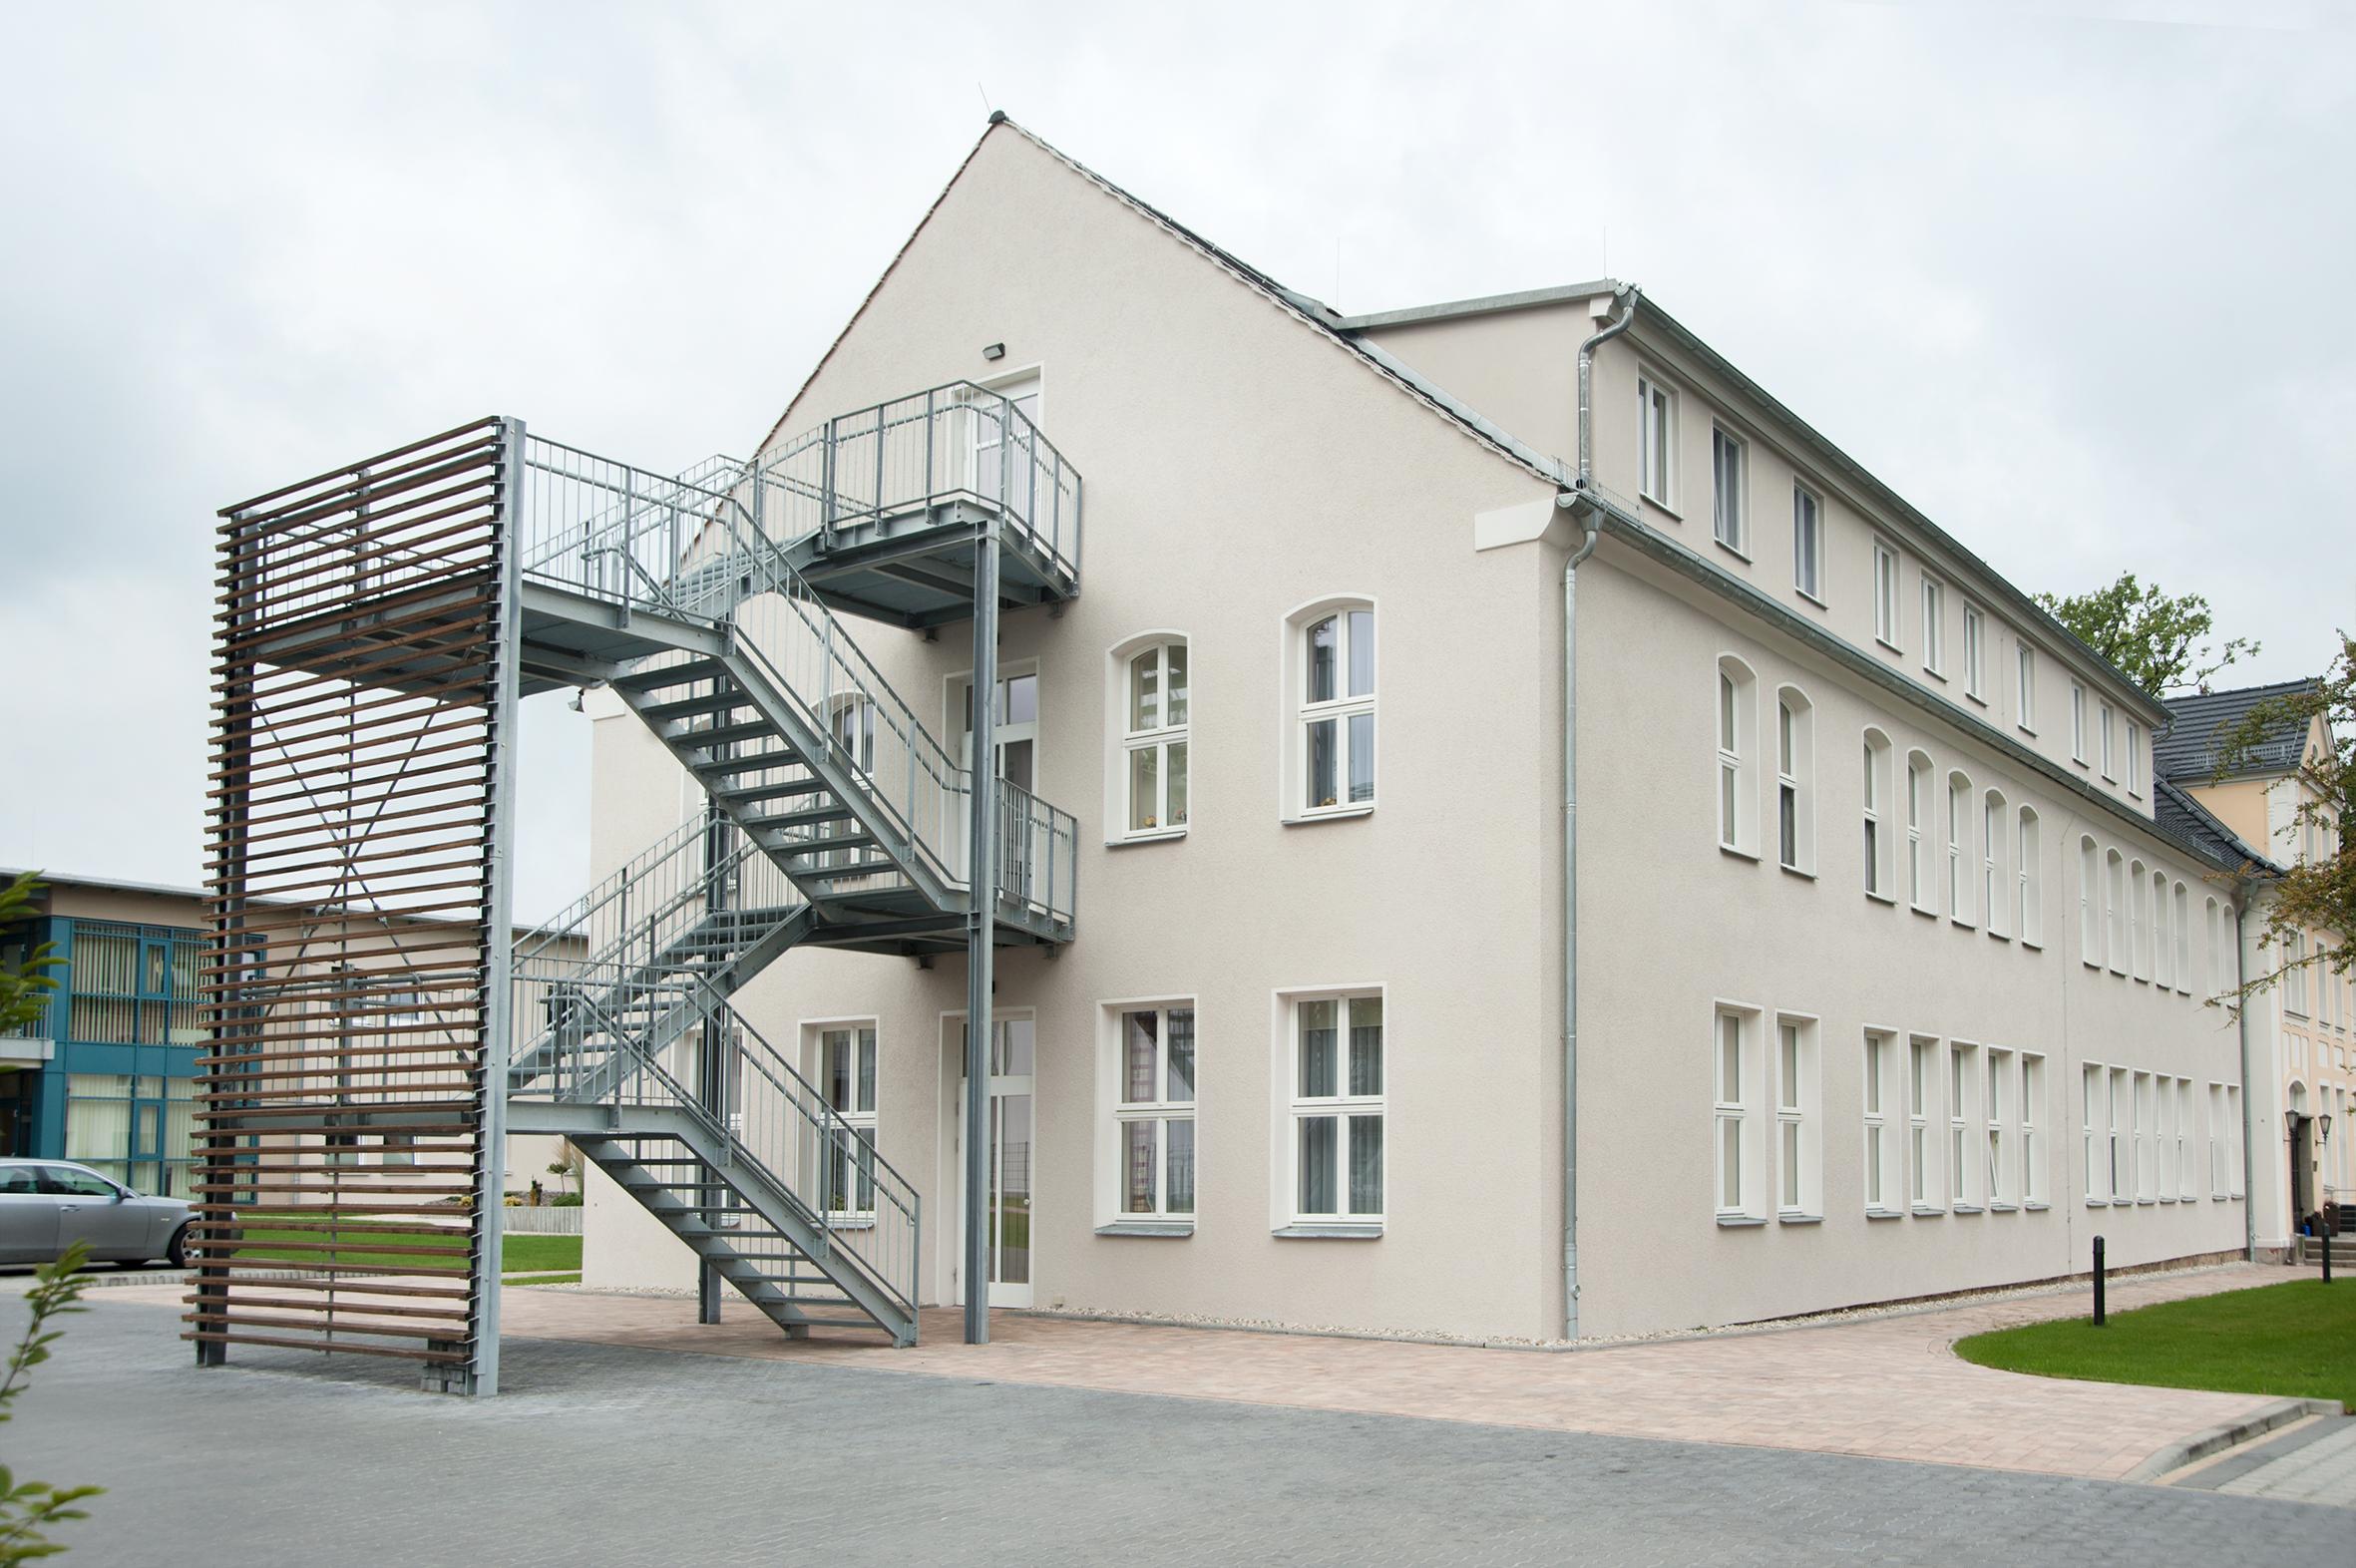 Schulstraße 12, Niesky